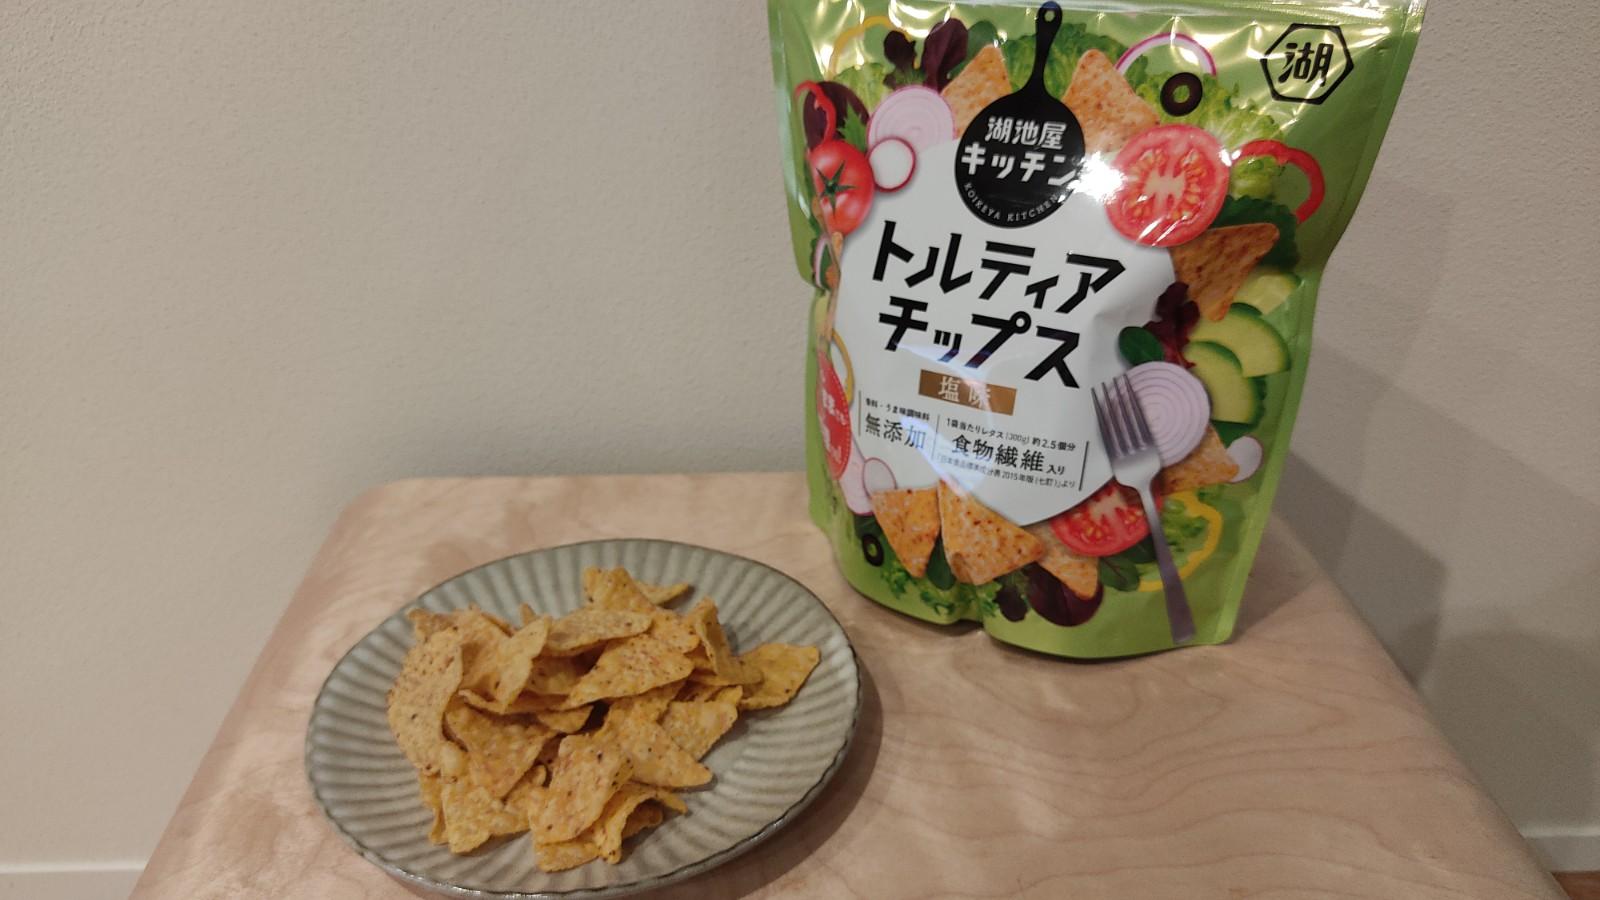 tortia chips